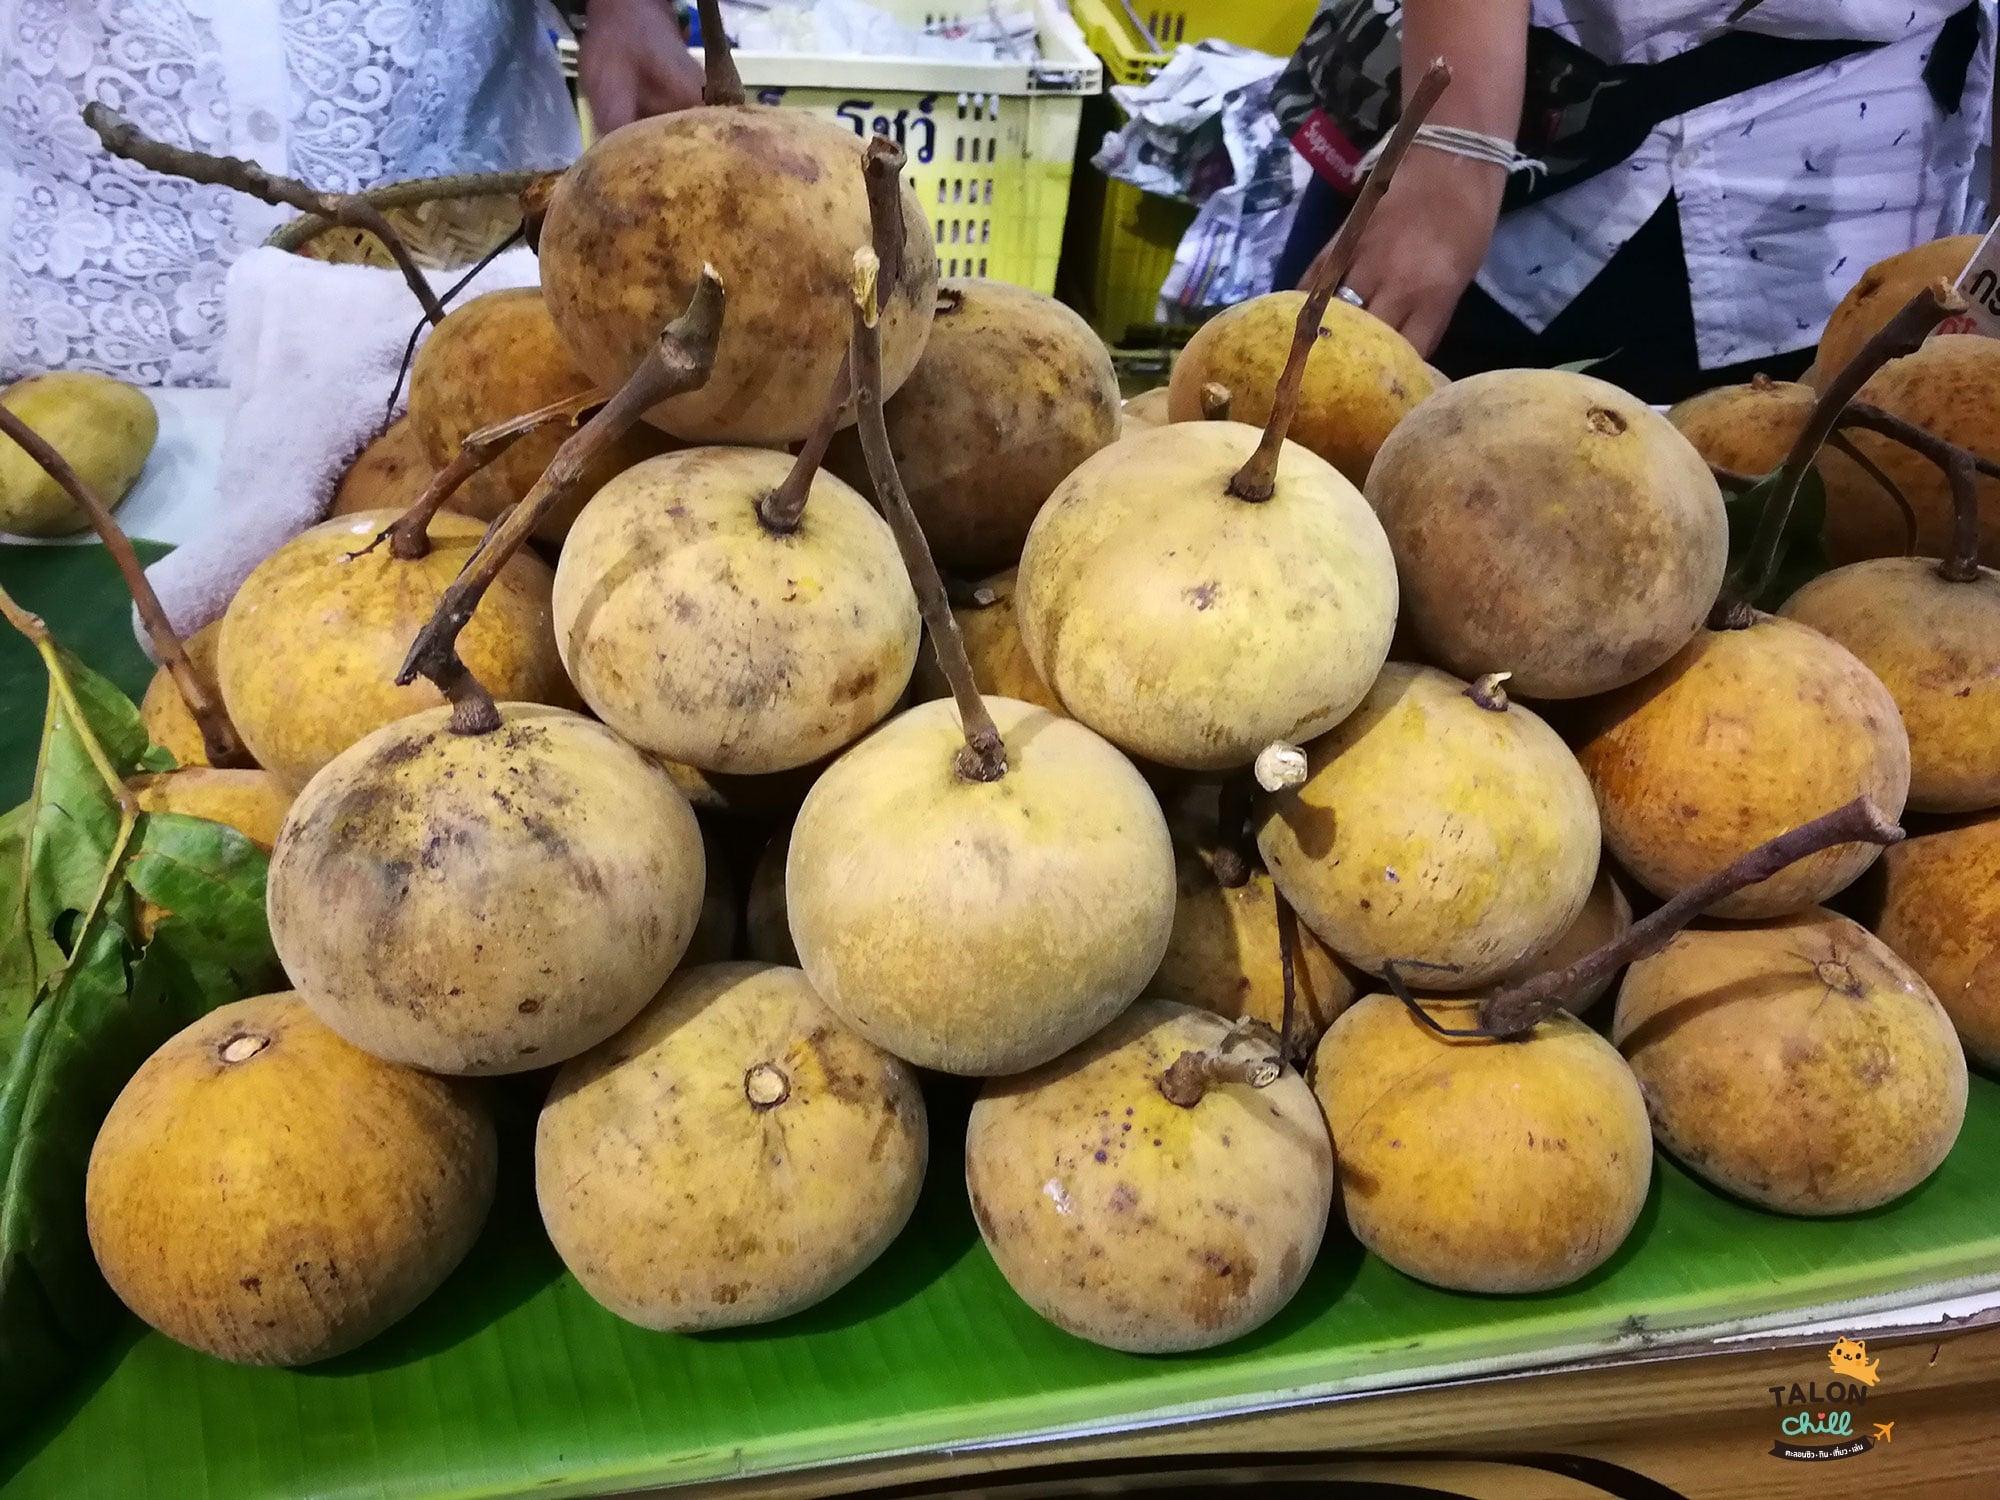 Nonthaburi Fruit Fest 2017 centralplaza rattanathibet 5